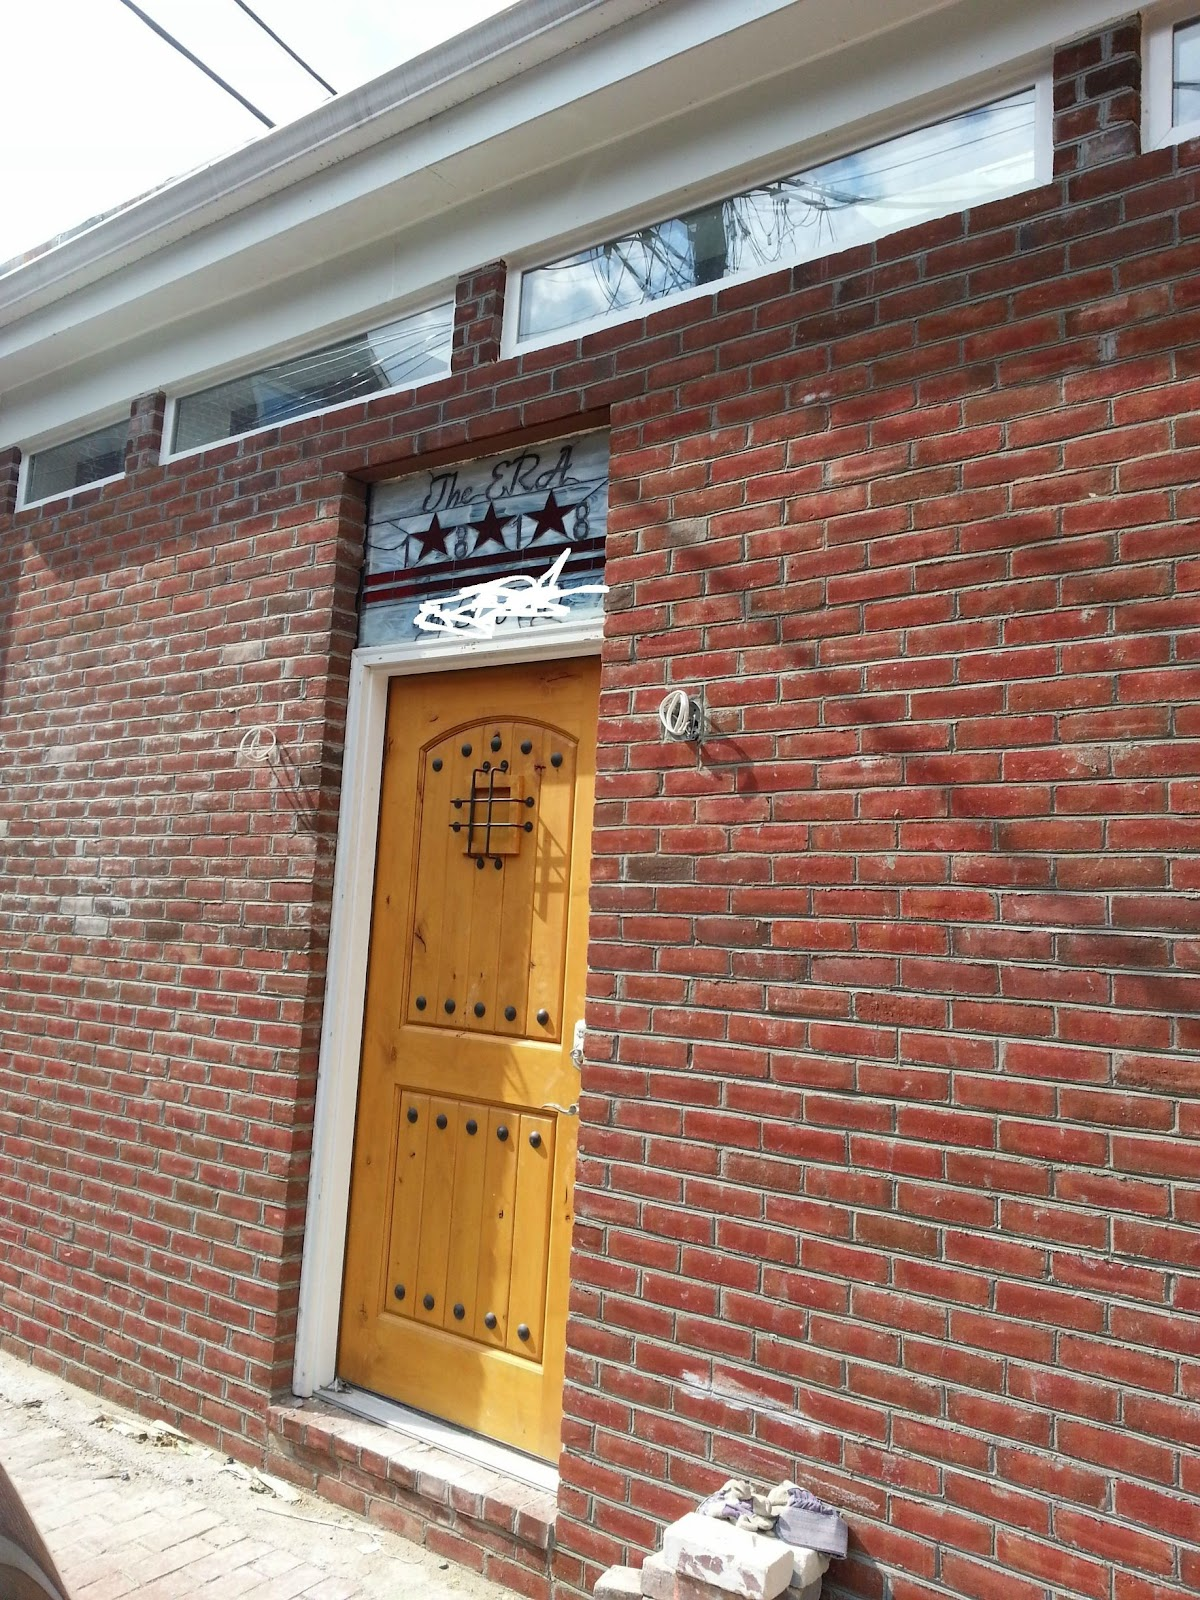 16-Brick-facade-imgur-Storage-Unit-Renovation-in-Tiny-Architecture-www-designstack-co